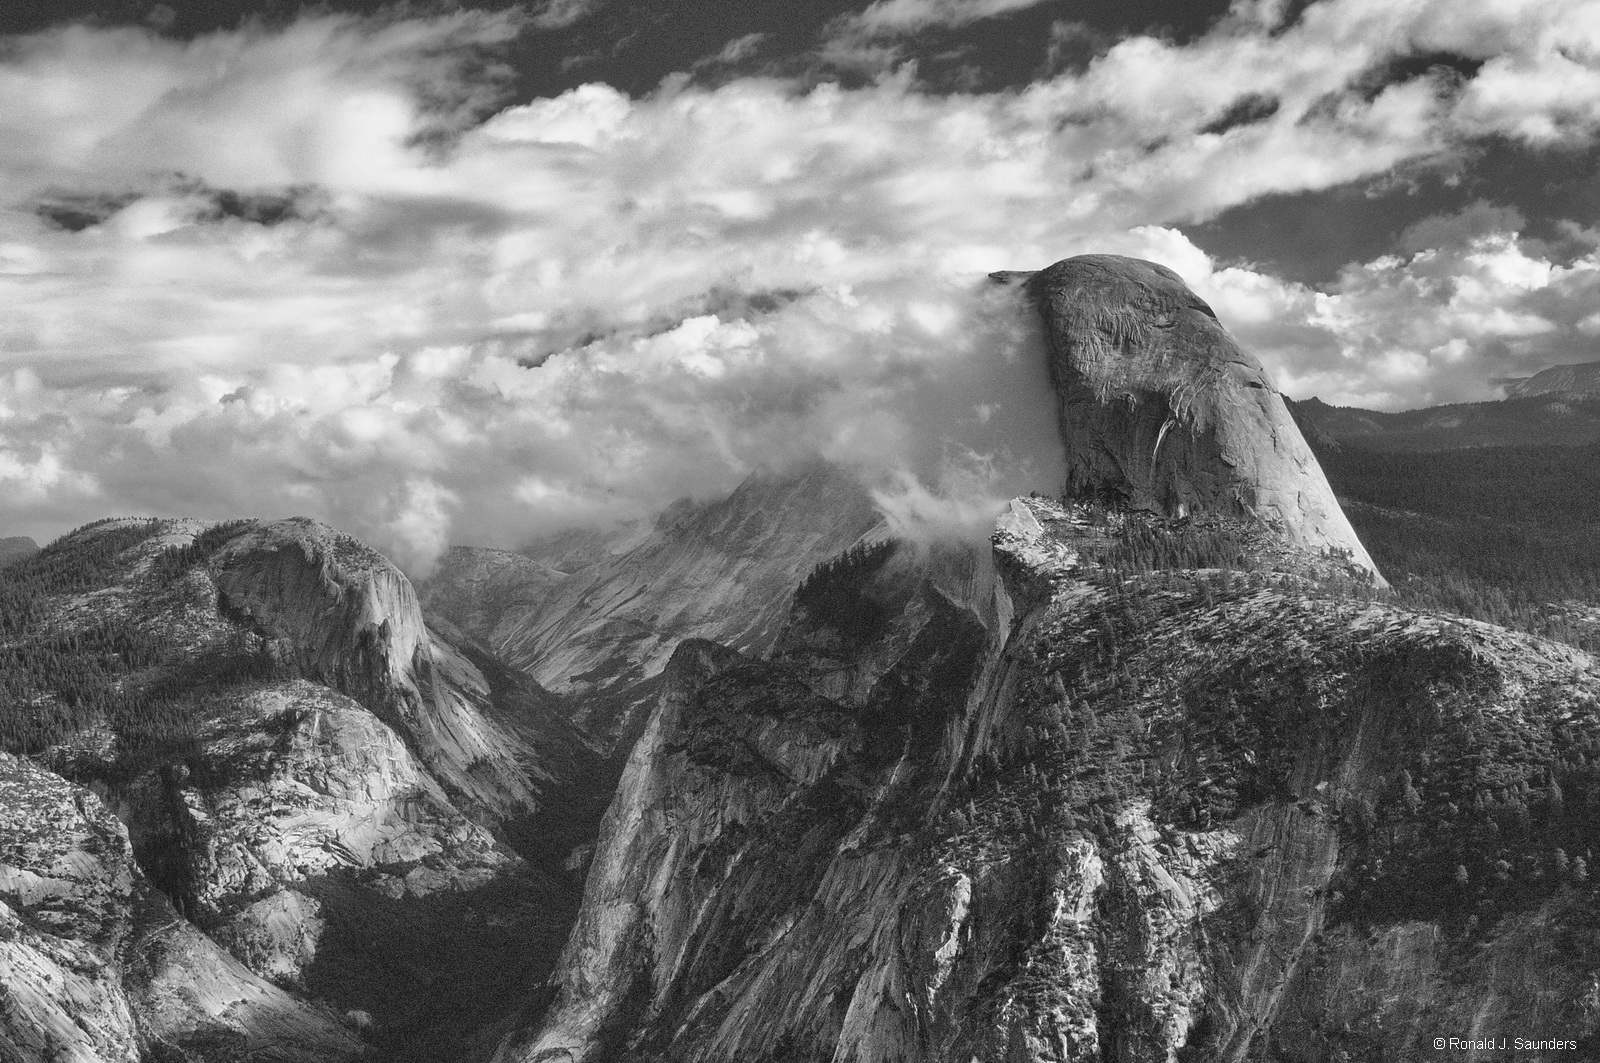 clouds, yosemite, half dome, B&W, landscape, ron, ron saunders, ronald, ronald j saunders, prints , photo